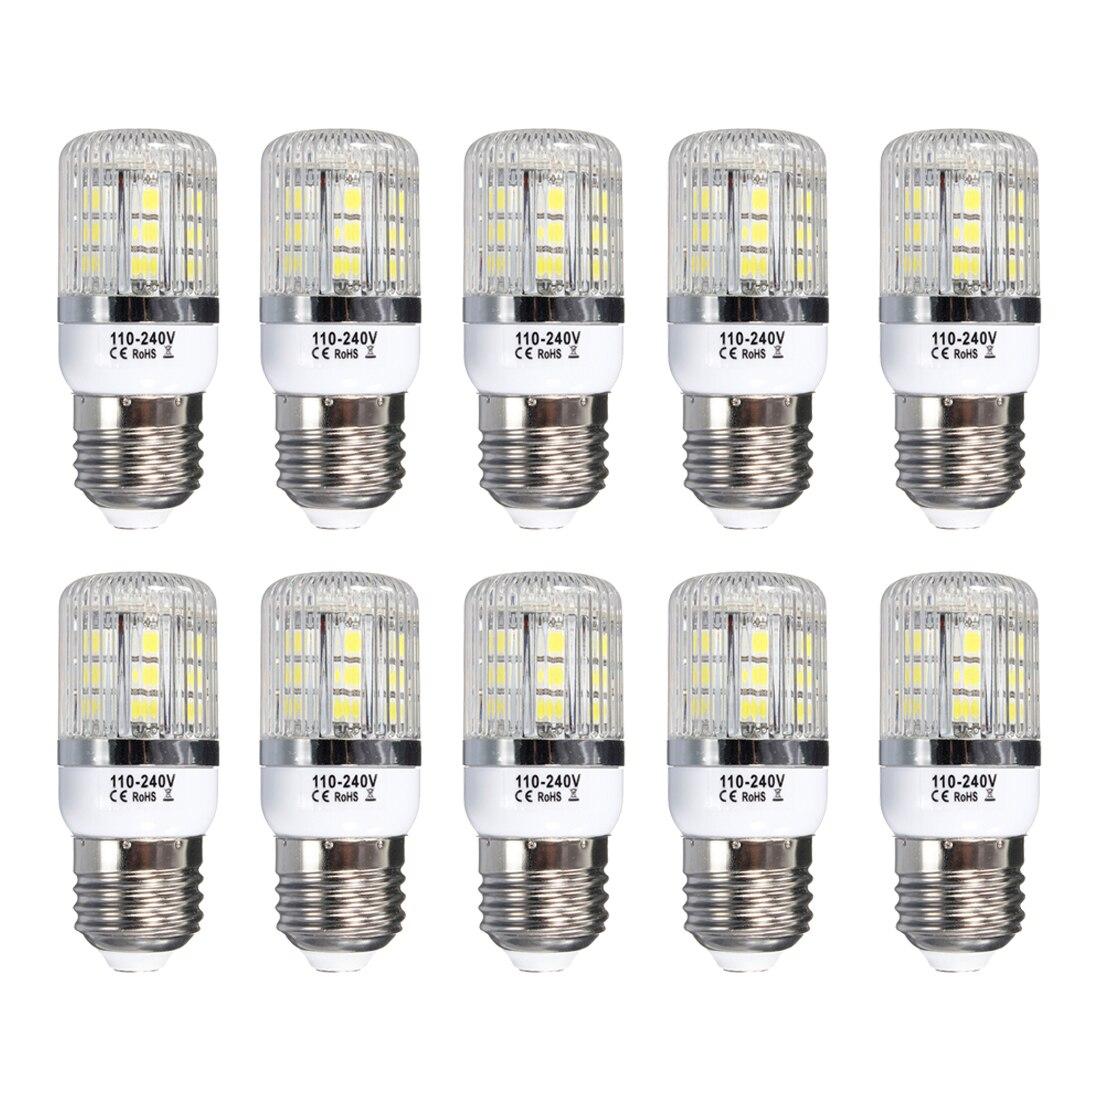 E27 5W Dimmable 27 SMD 5050 LED Corn Light Bulb Lamp Base Type:E27-5W Warm White(3000-3500K) Amount:10 Pcs g9 5w dimmable 27 smd 5050 led corn light bulb lamp color temperature pure white 6000 6500k amount 8 pcs